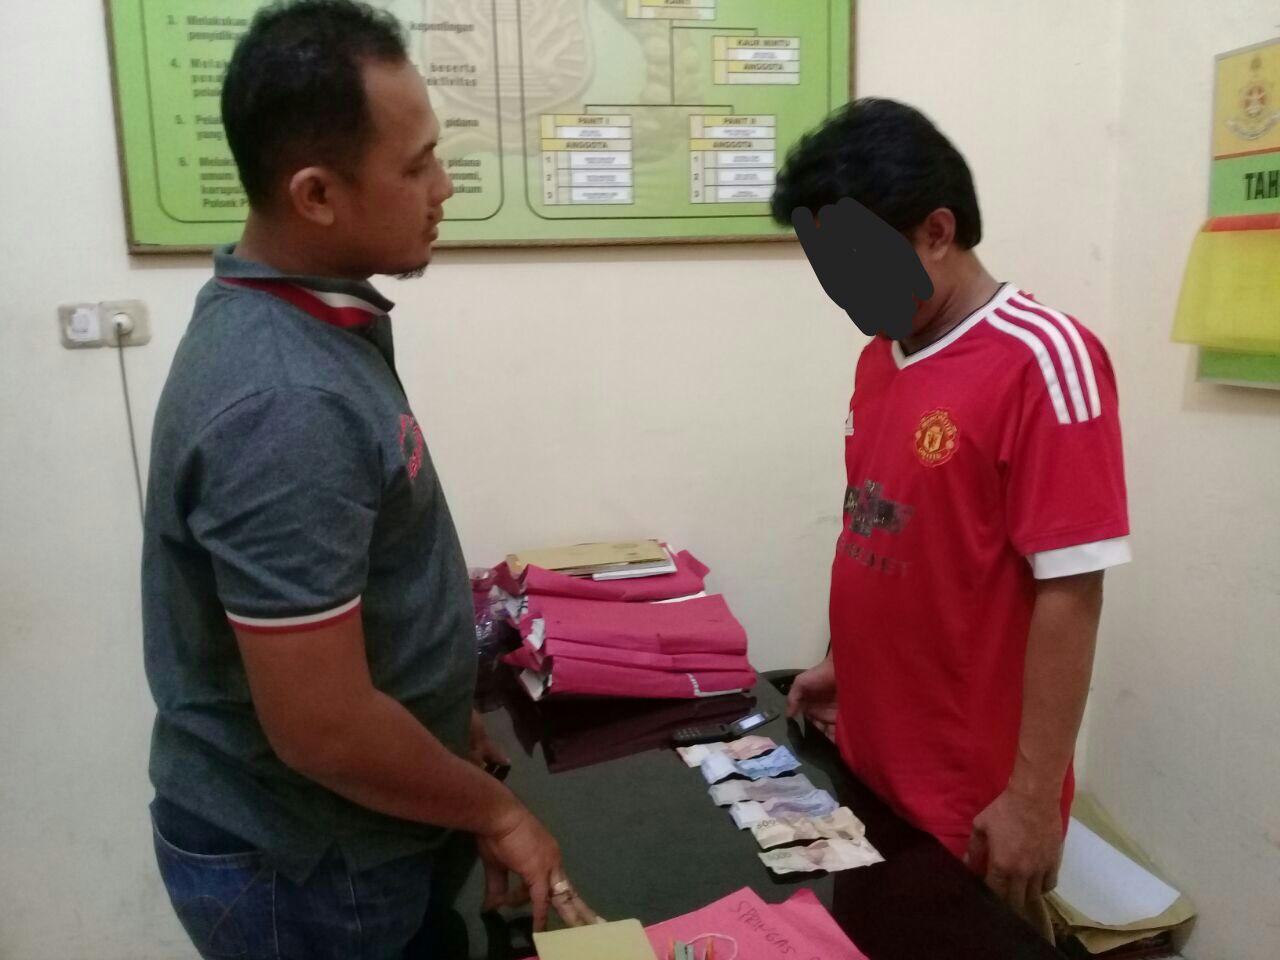 Penjual Togel, Warga Jalan Cempaka Kerinci Ditangkap